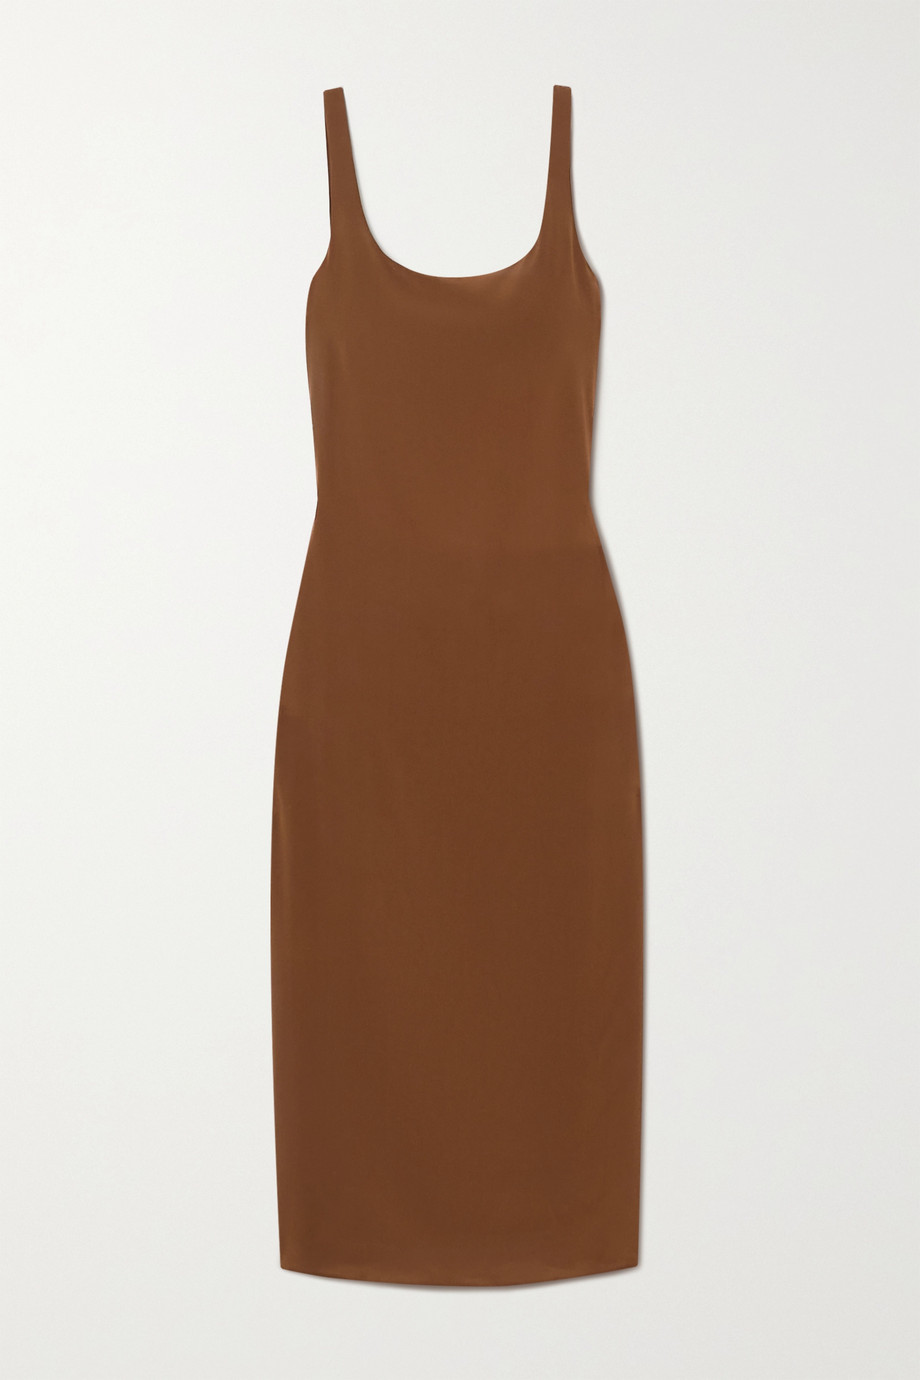 Matteau + NET SUSTAIN silk crepe de chine midi dress